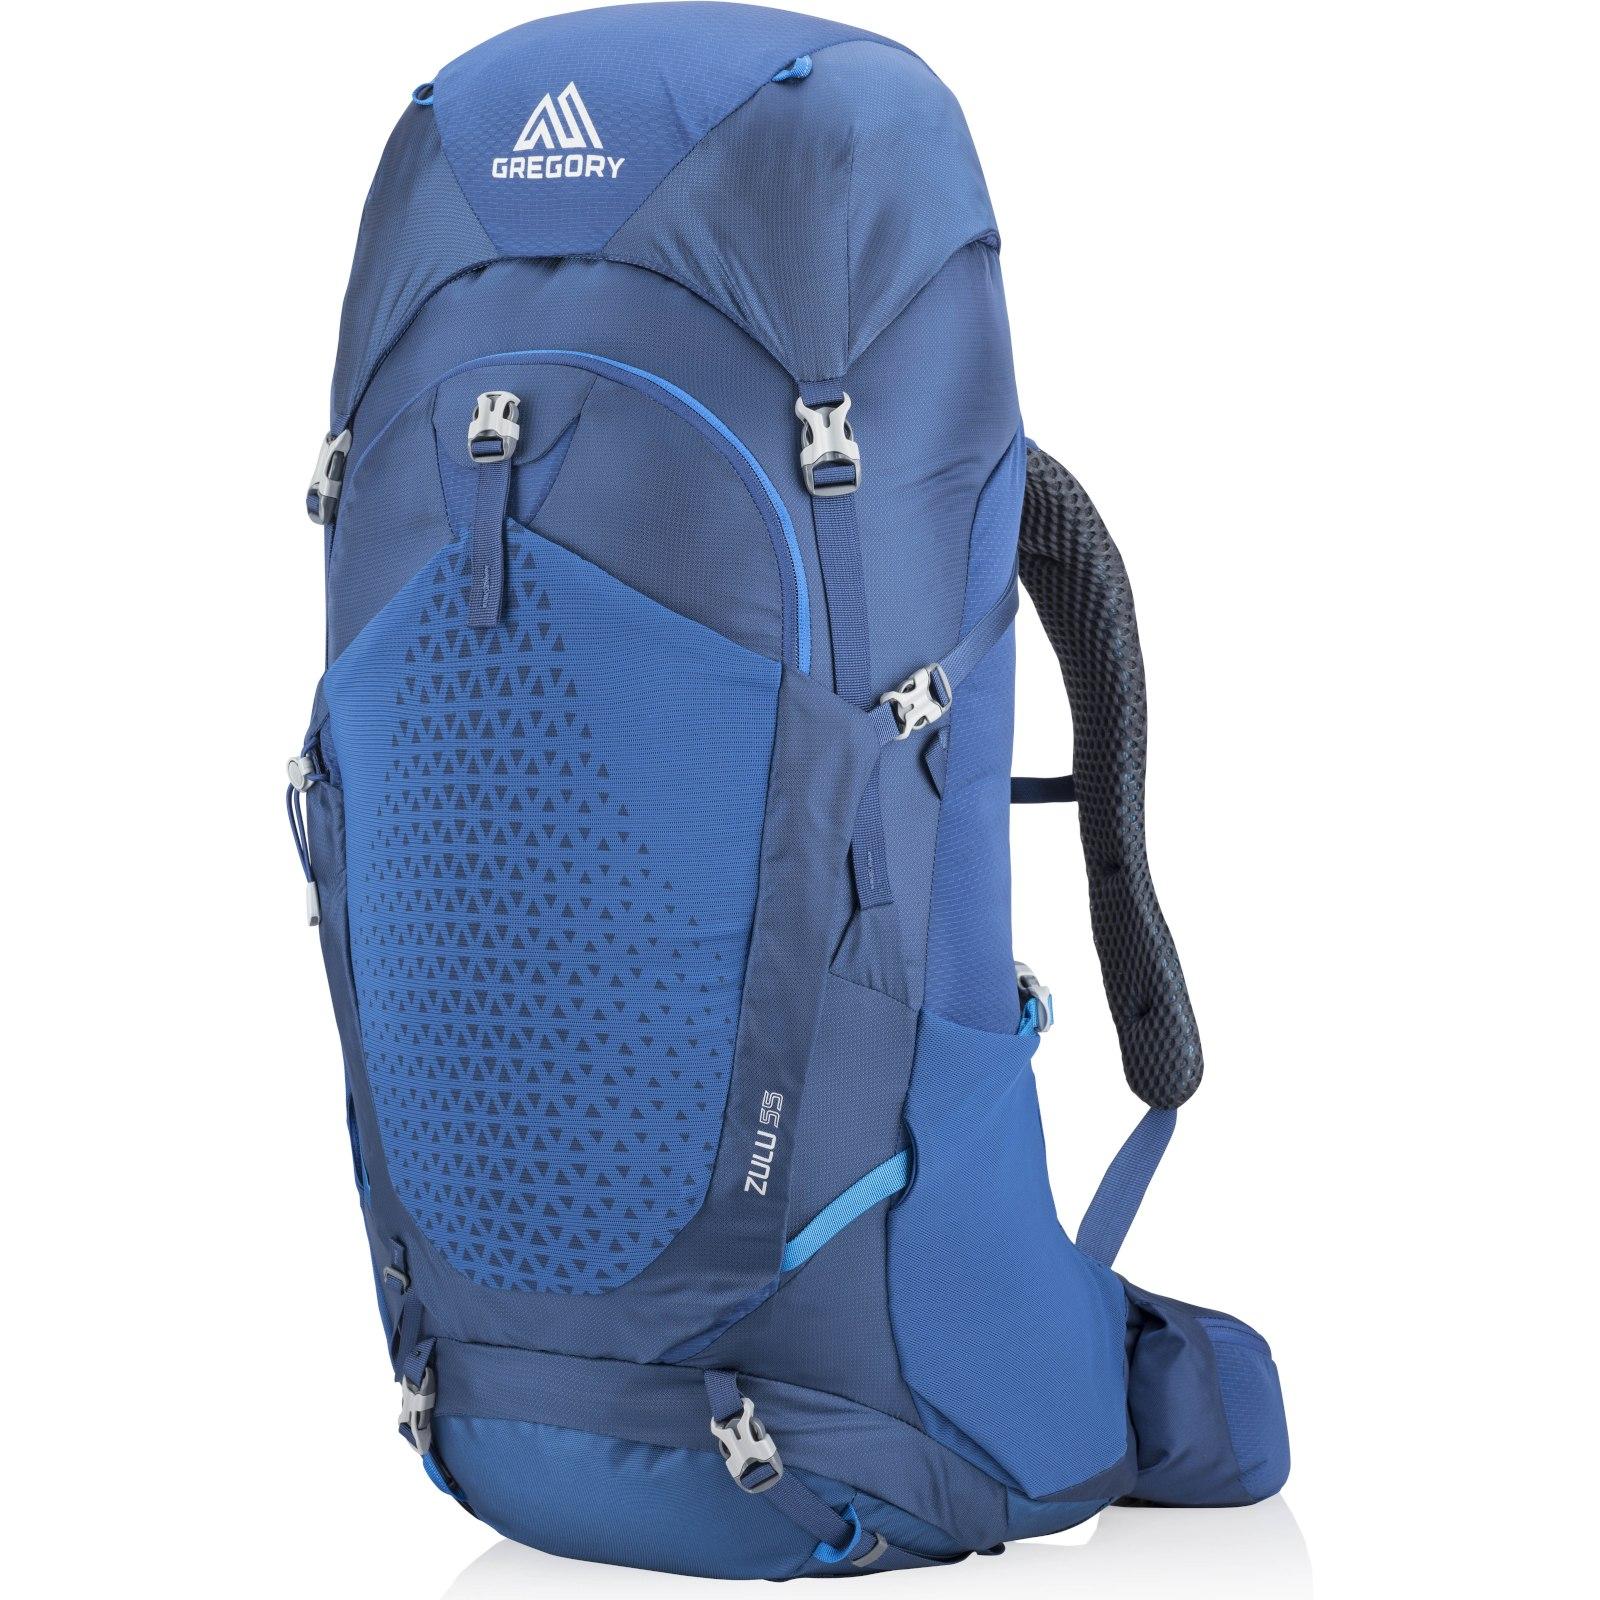 Gregory Zulu 55 Backpack - Empire Blue